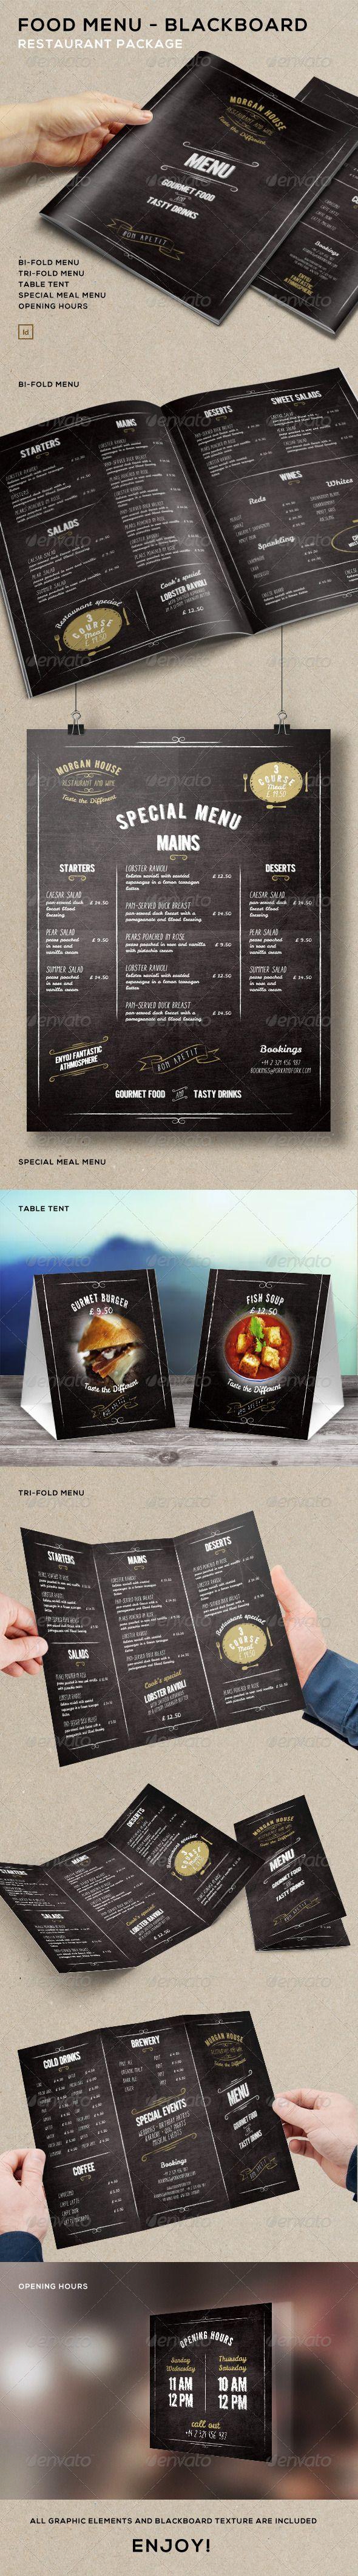 PRODUTO POSSÍVEL Food Menu - BlackBoard Restaurant Package